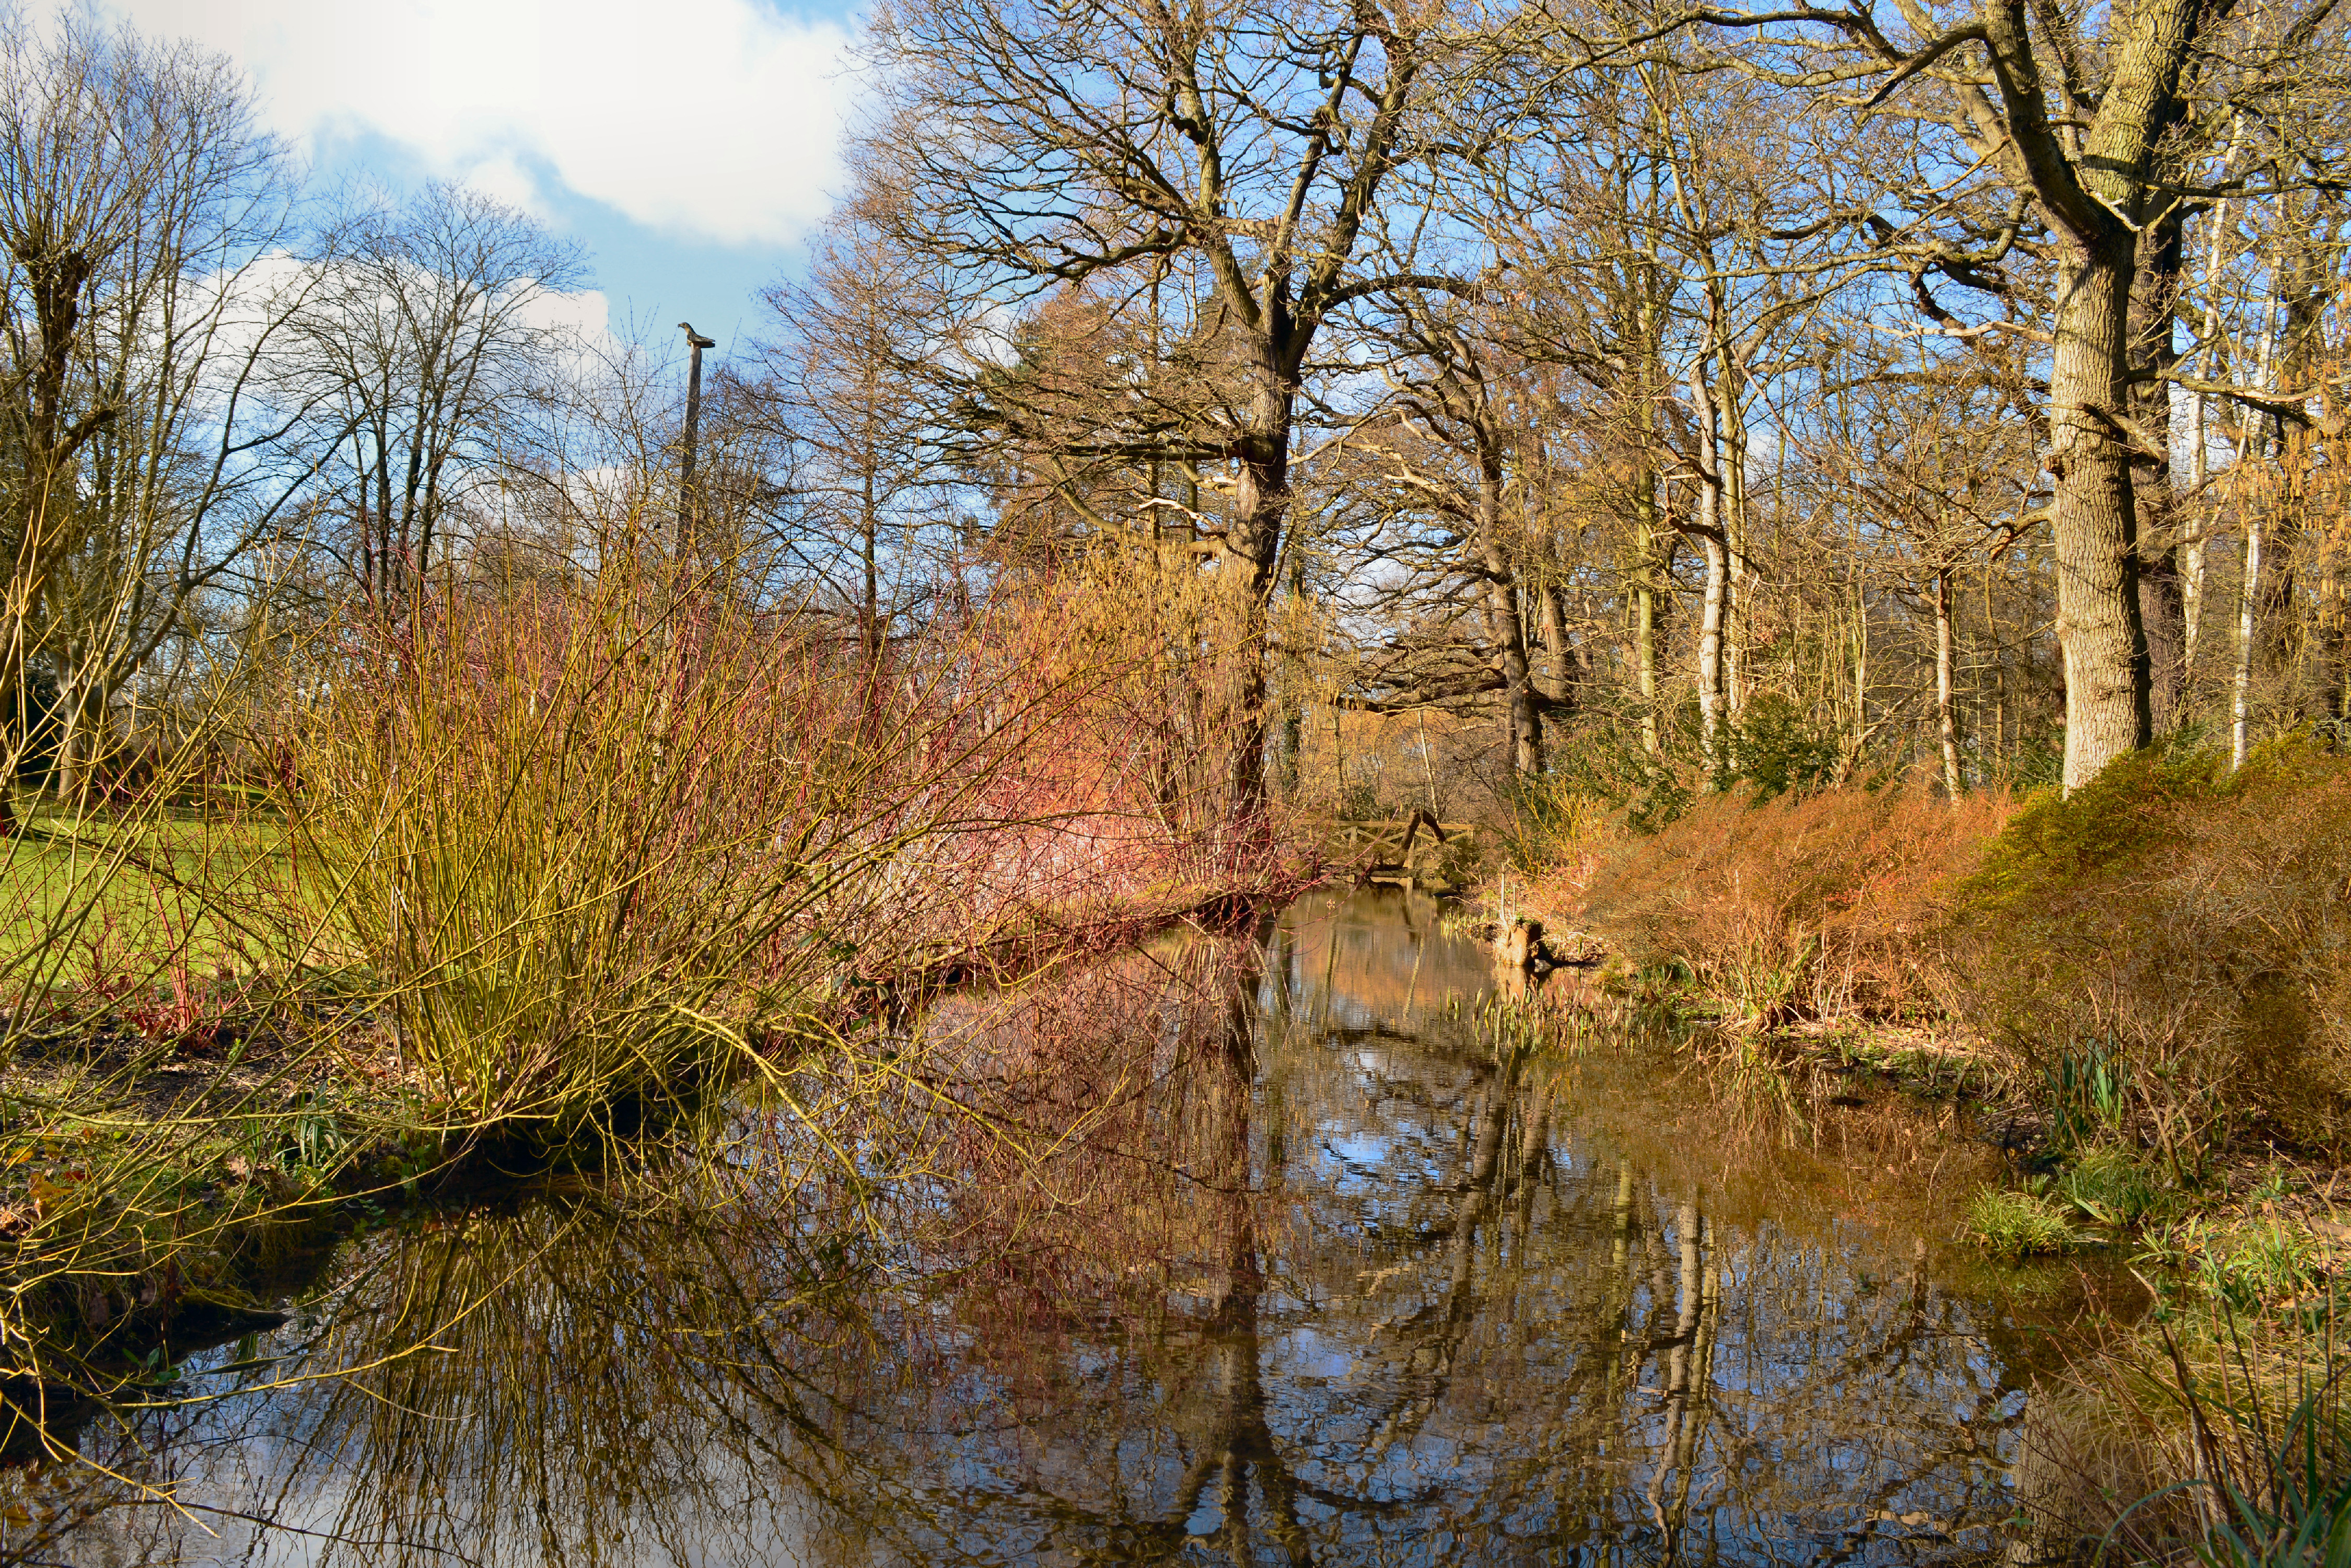 File:The Canadian Glade, Waterhouse Woodland Garden.jpg - Wikimedia ...